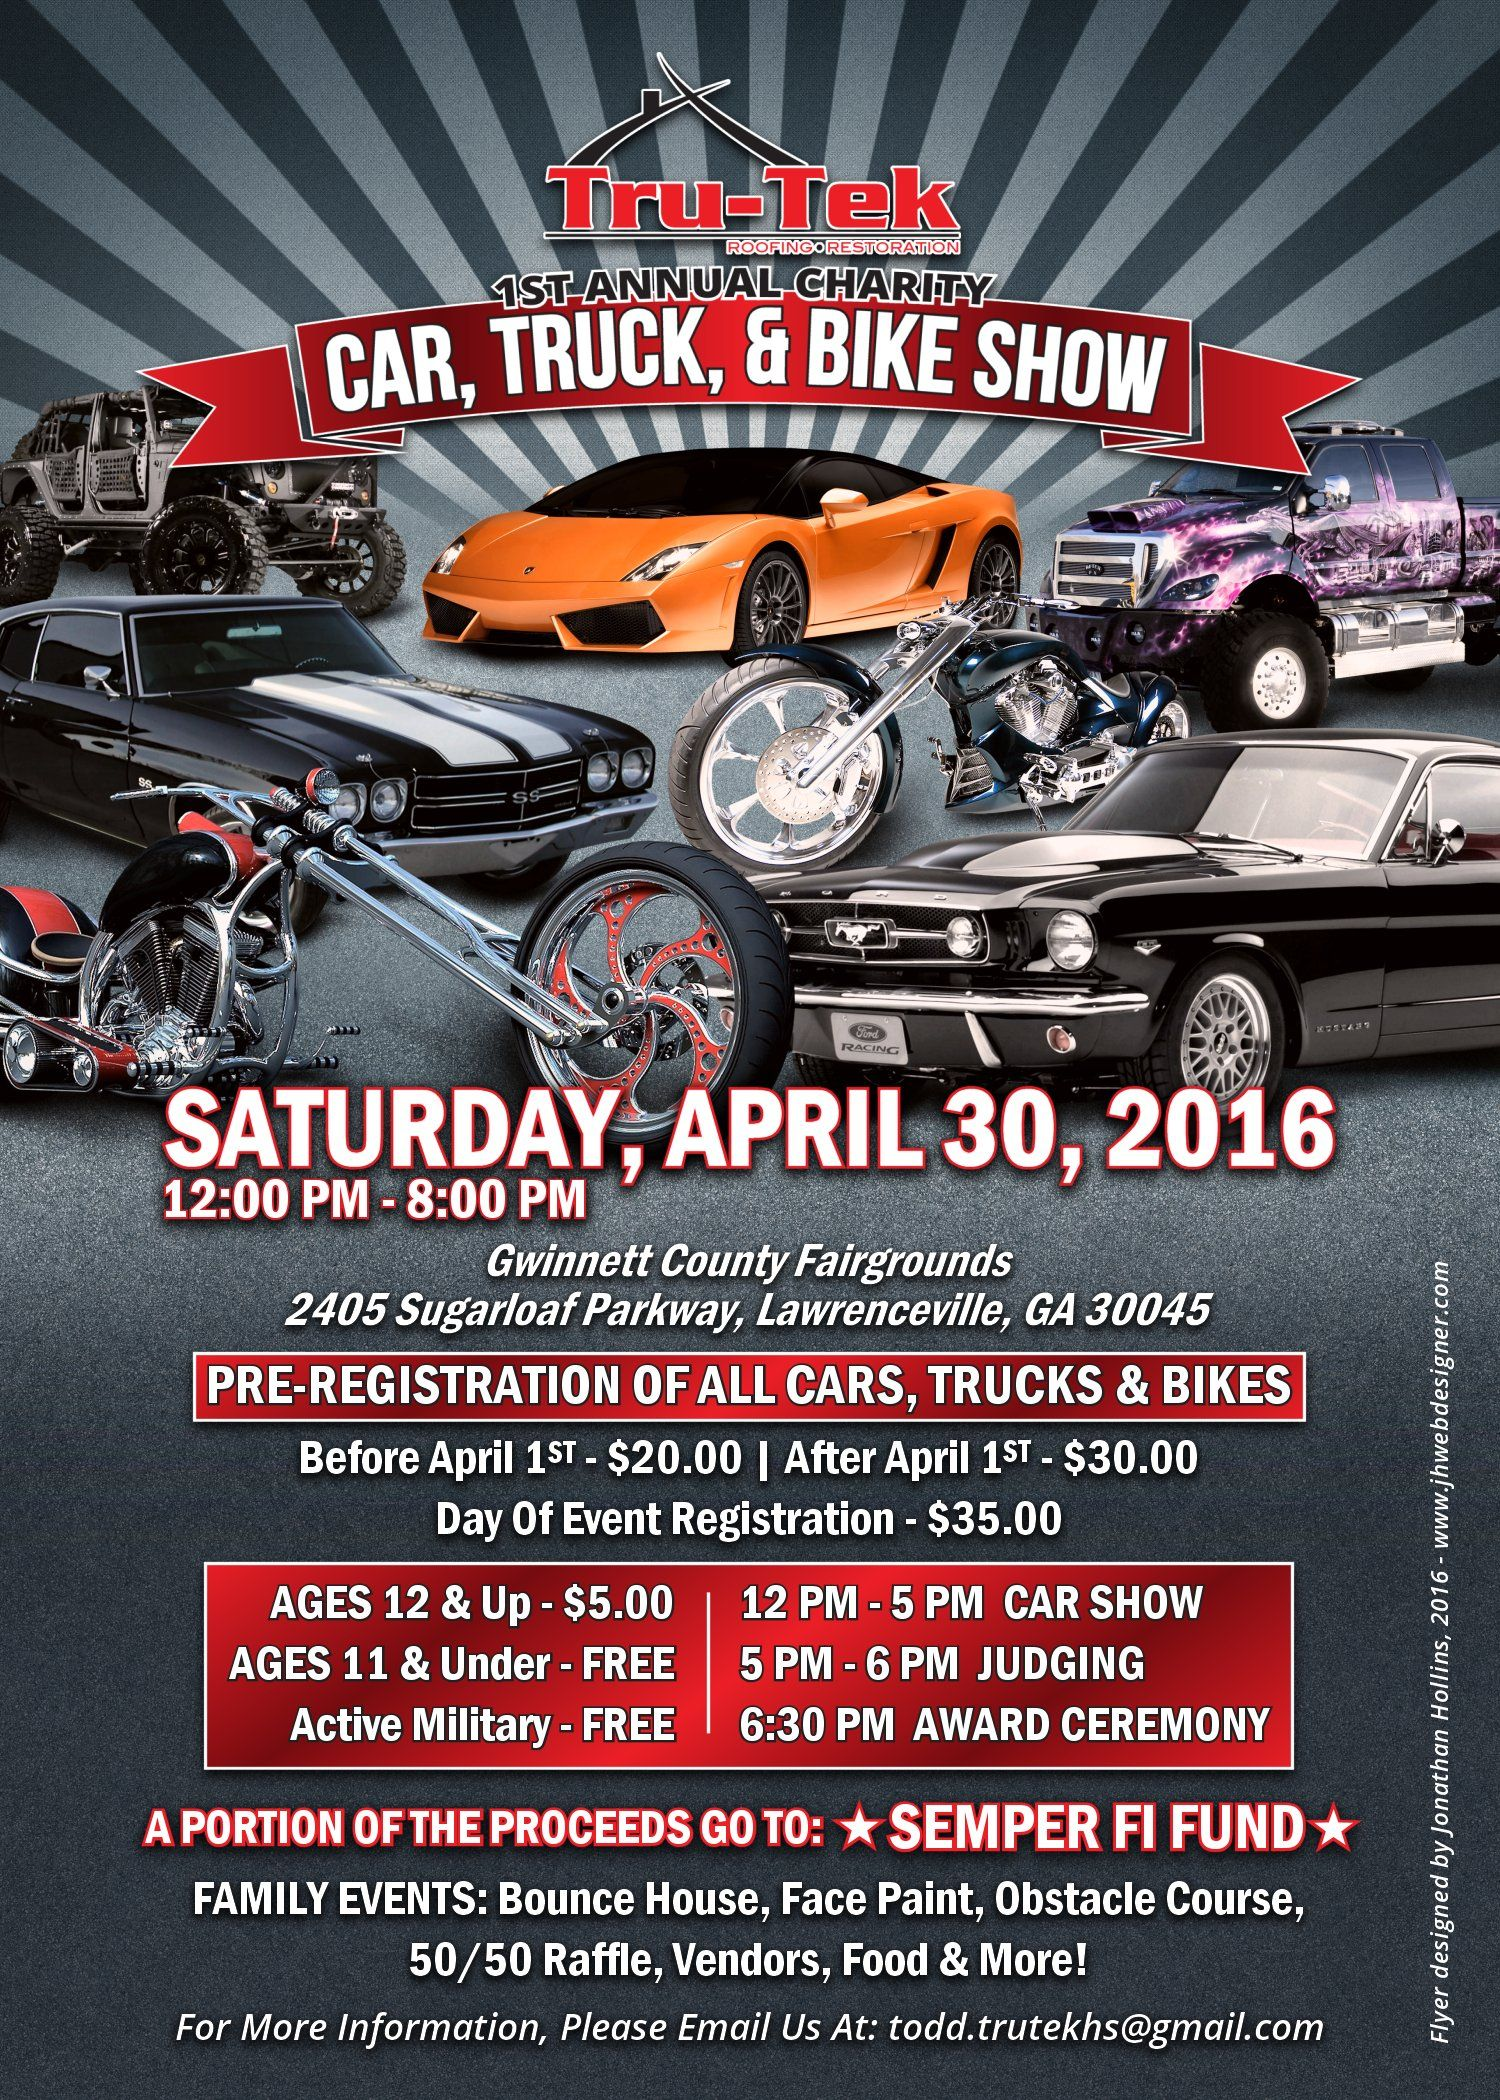 Tru Tek Car Truck Bike Show Flyer Jh Web Designer Blog With